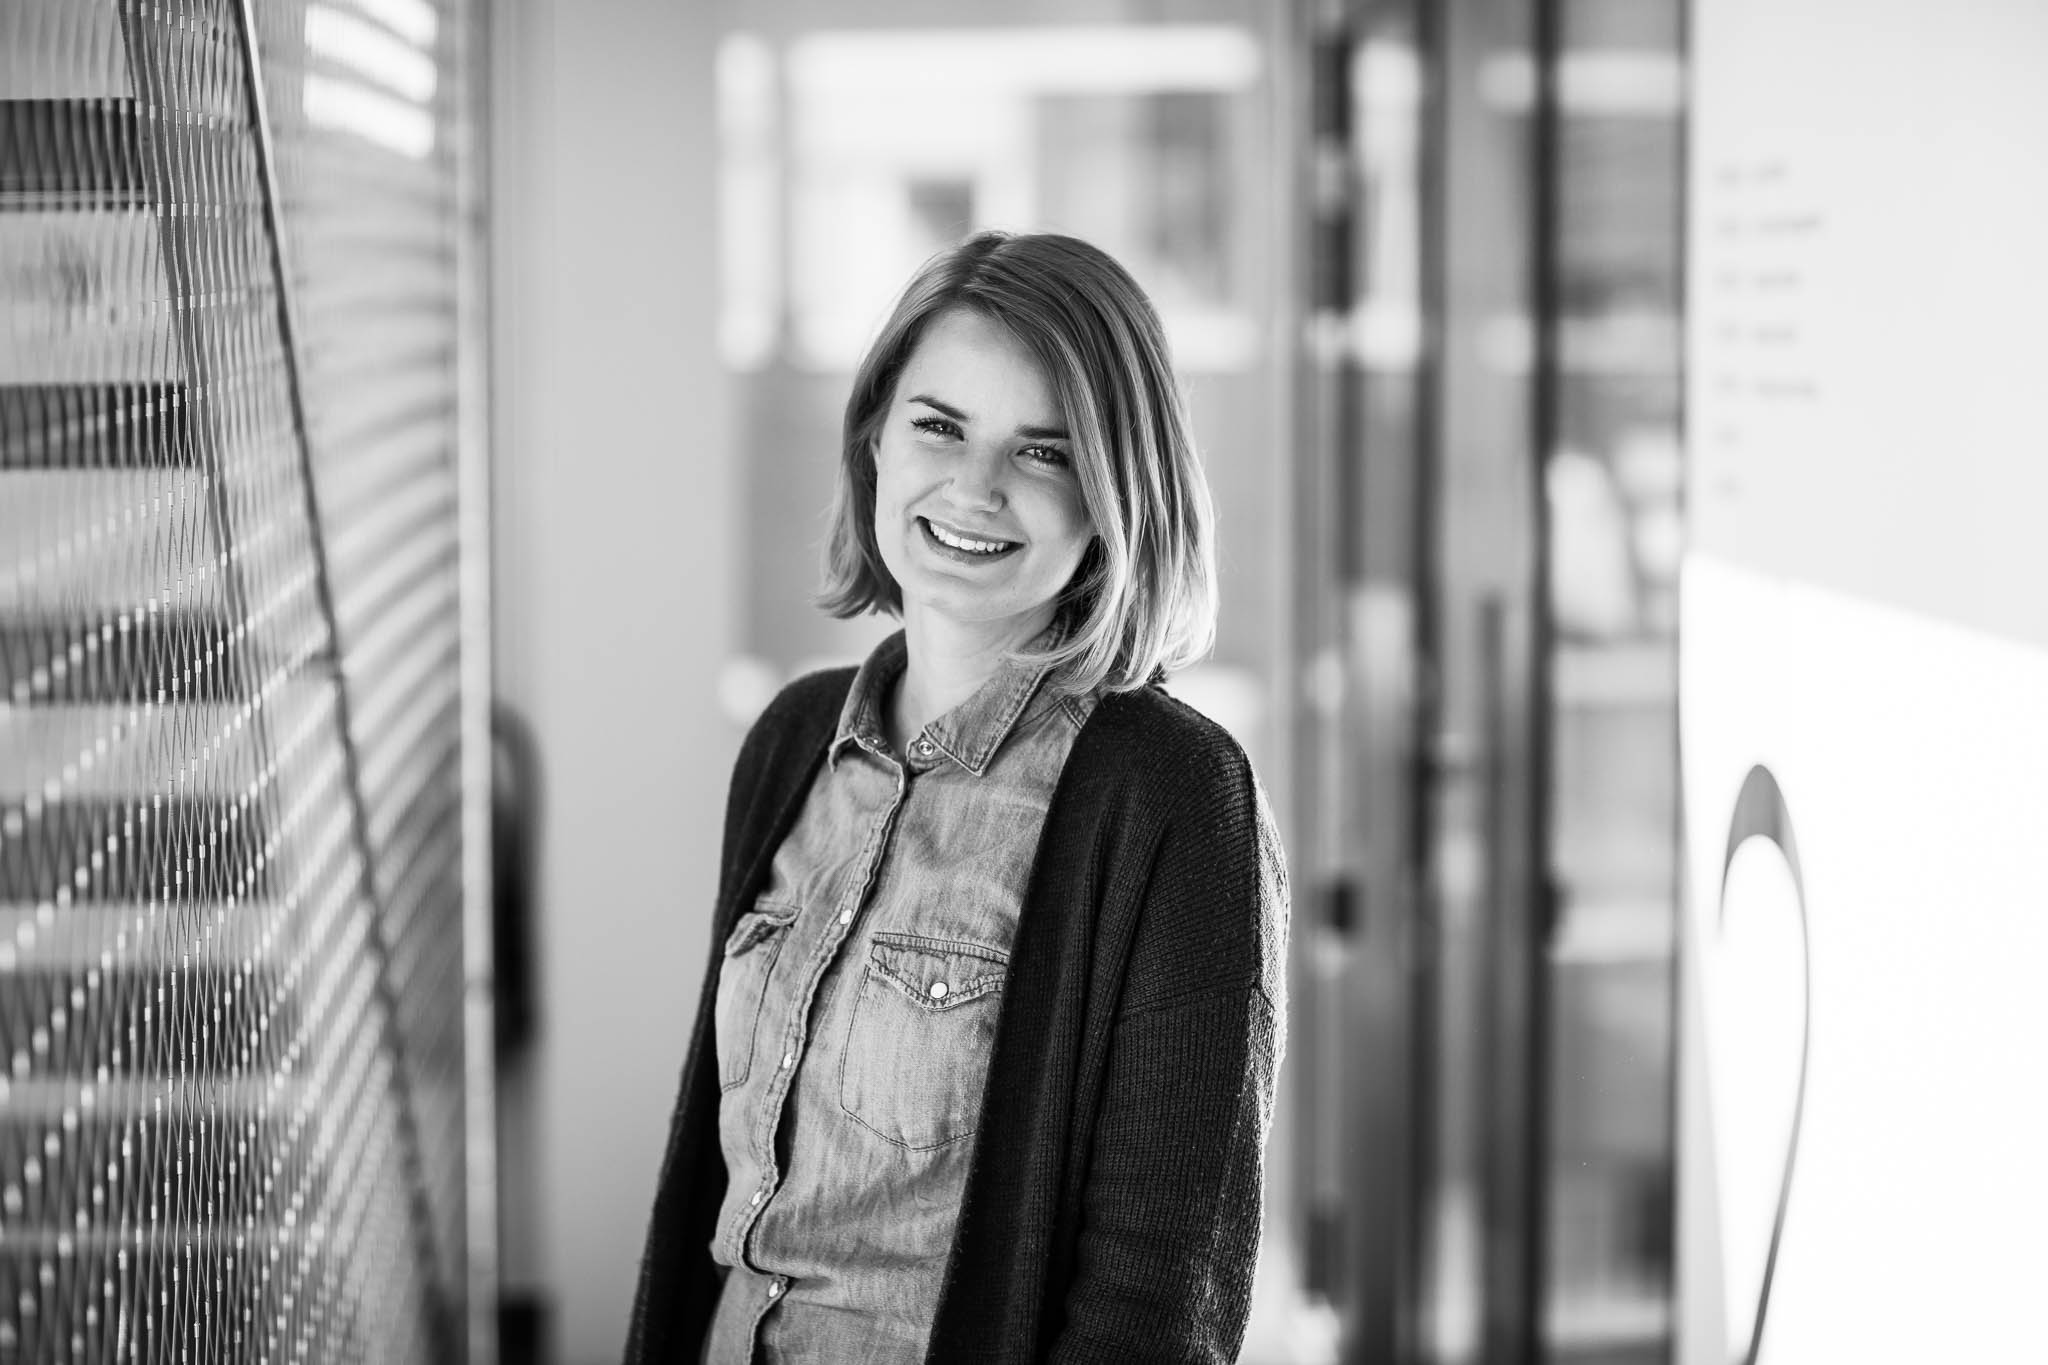 Martina Kogler (c) moodley brand identity, Lilly Mörz